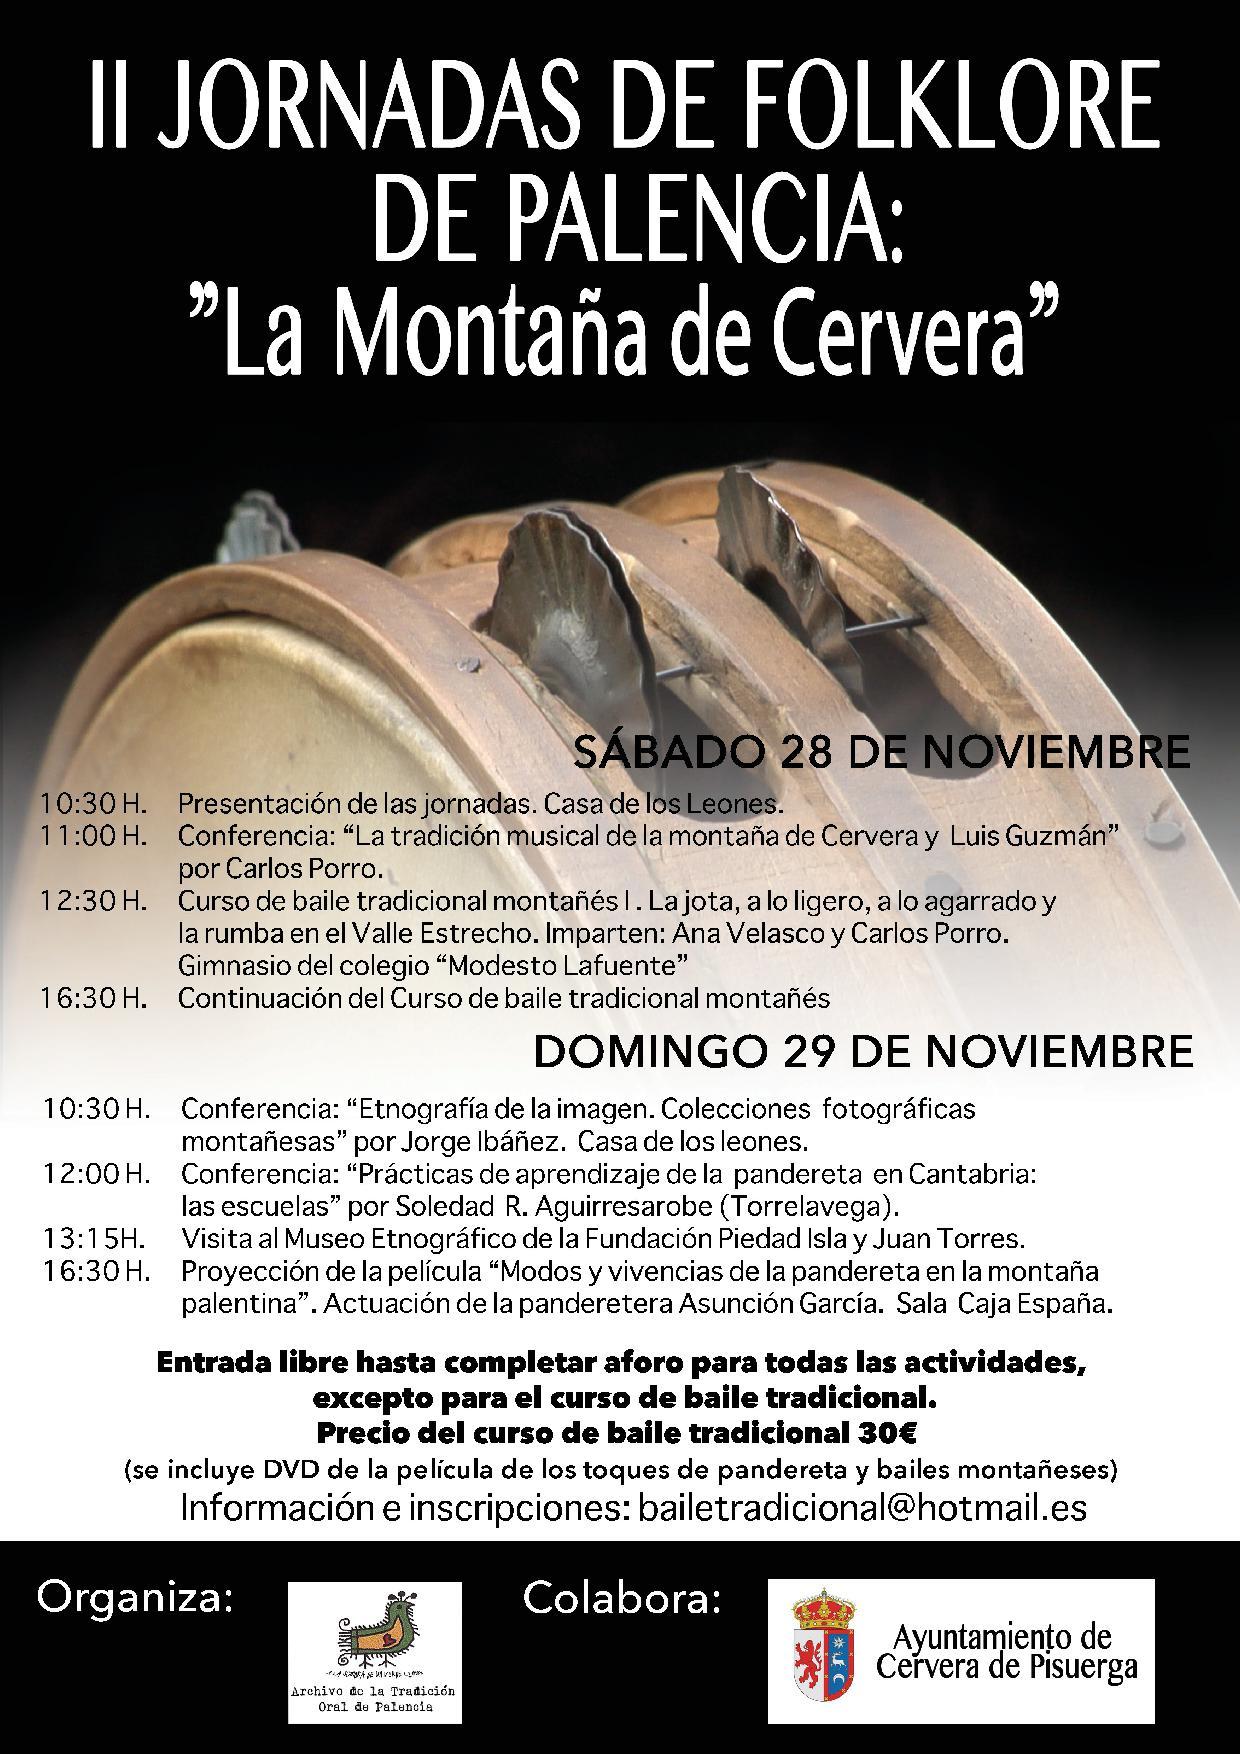 II Jornadas de Folklore de Palencia: La Montaña de Cervera